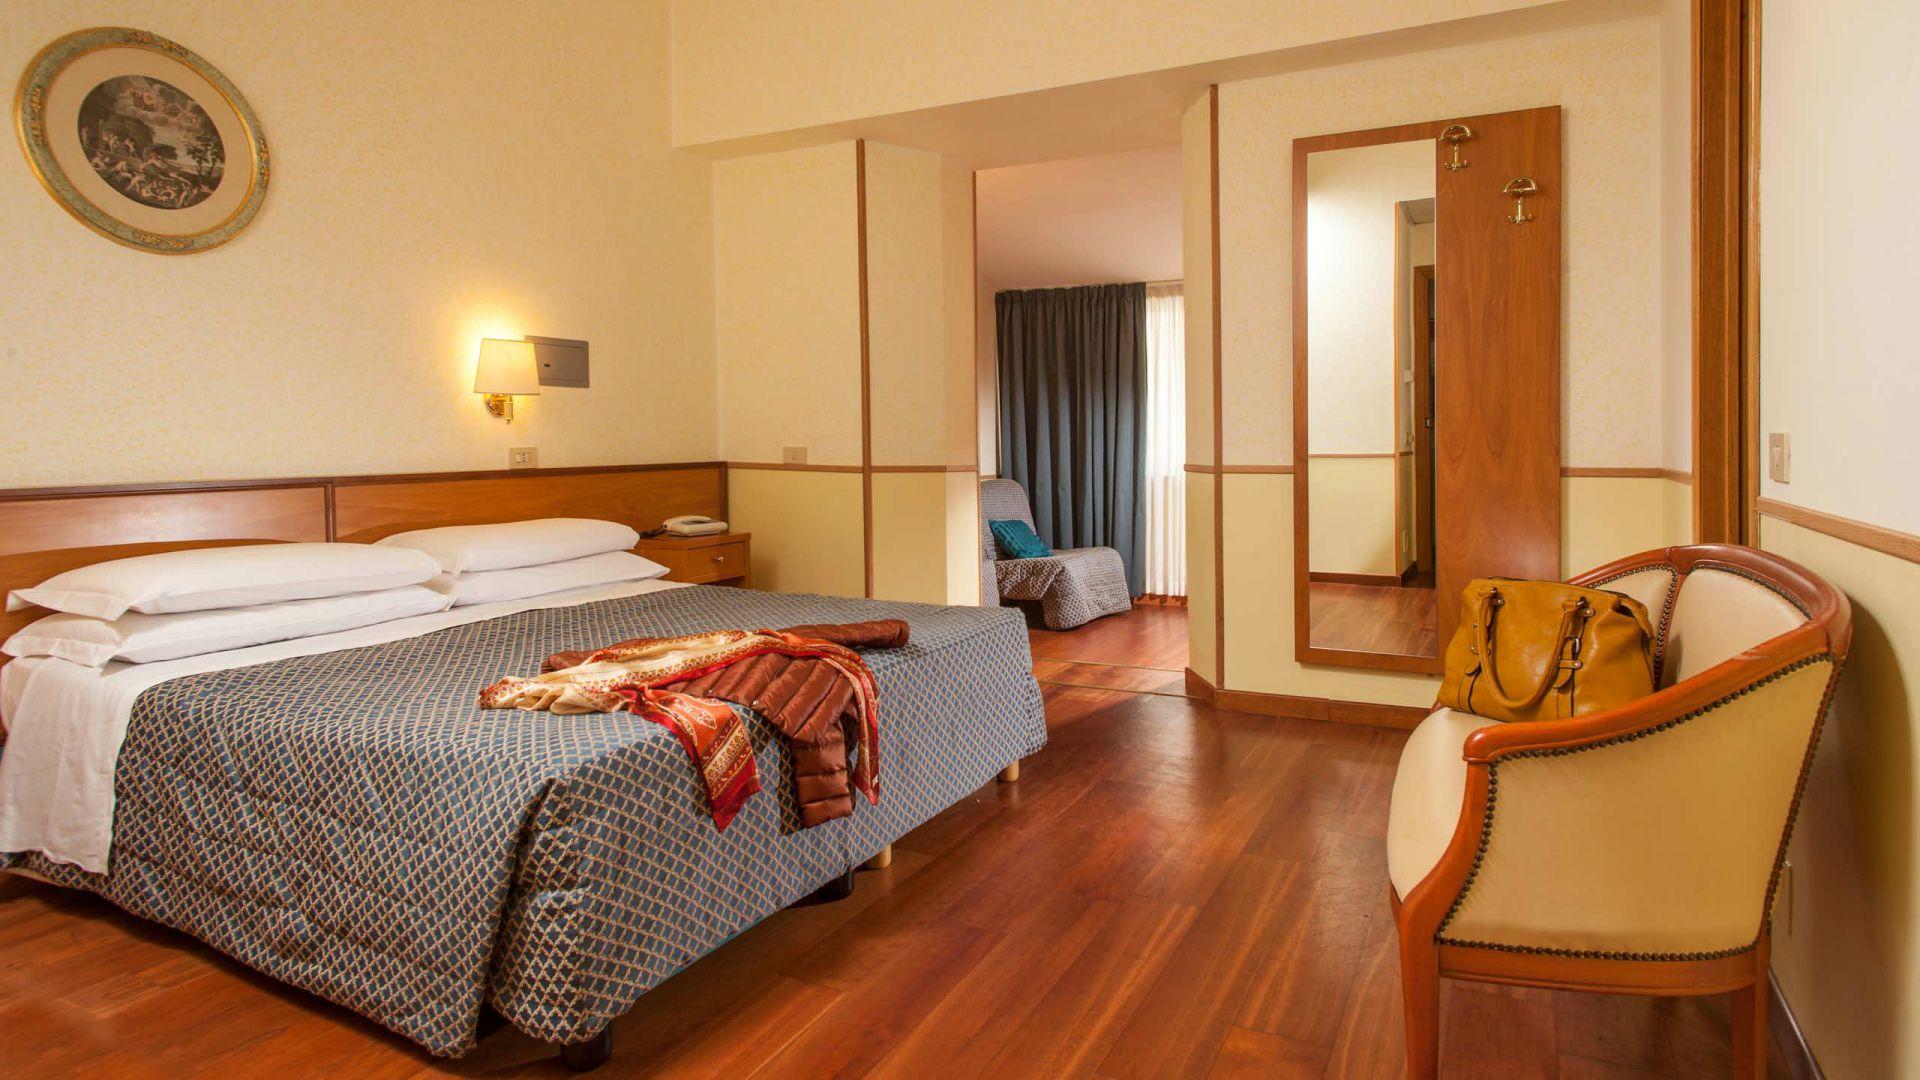 hotel-piemonte-roma-camere-06